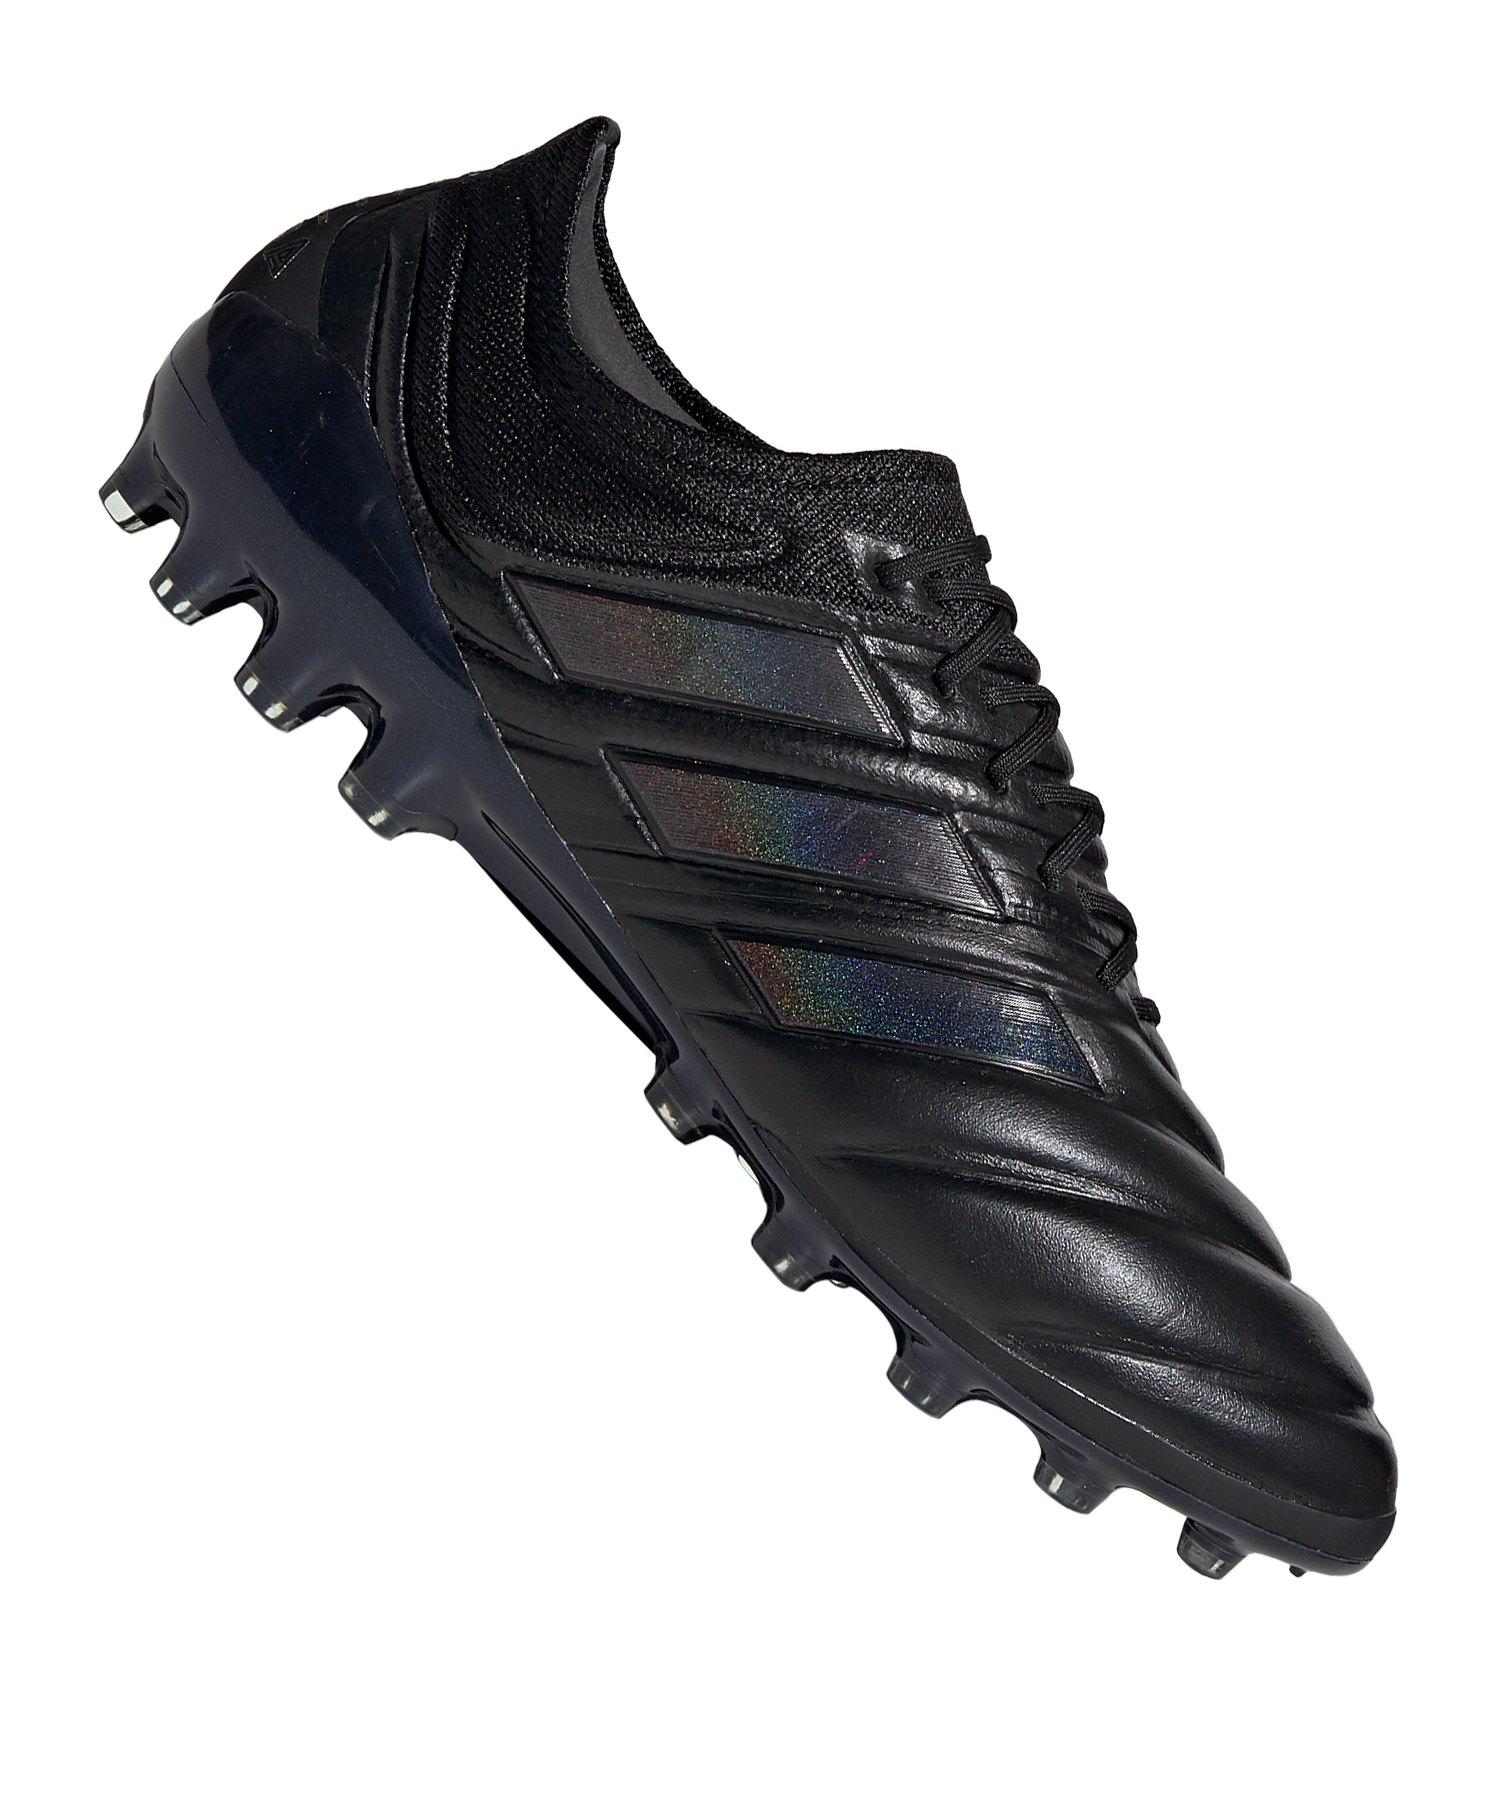 adidas COPA 19.1 AG Schwarz - schwarz